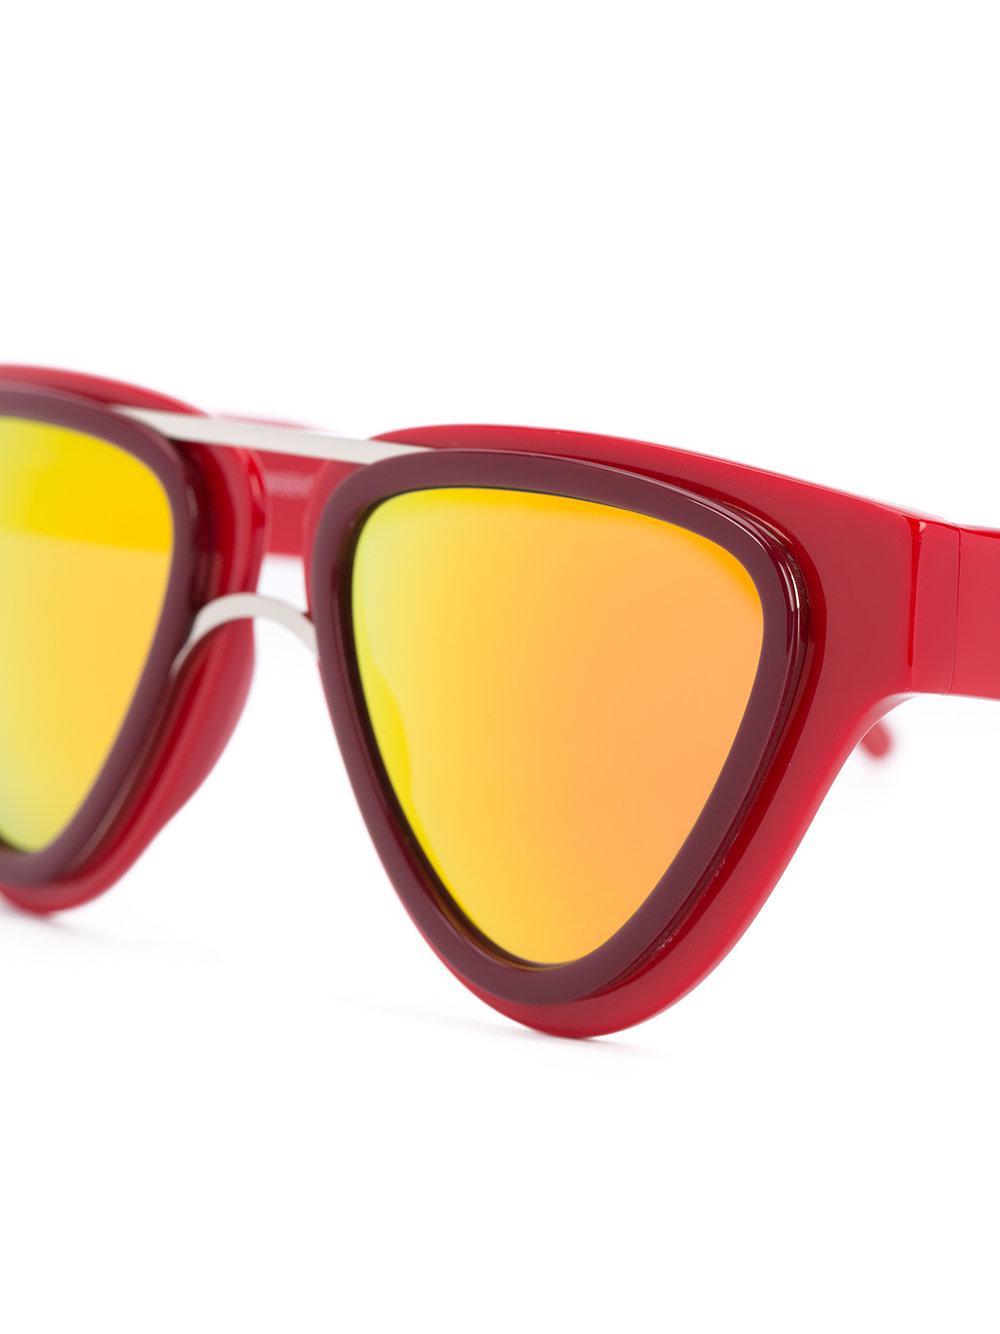 Smoke X Mirrors Sodapop V Sunglasses in Red